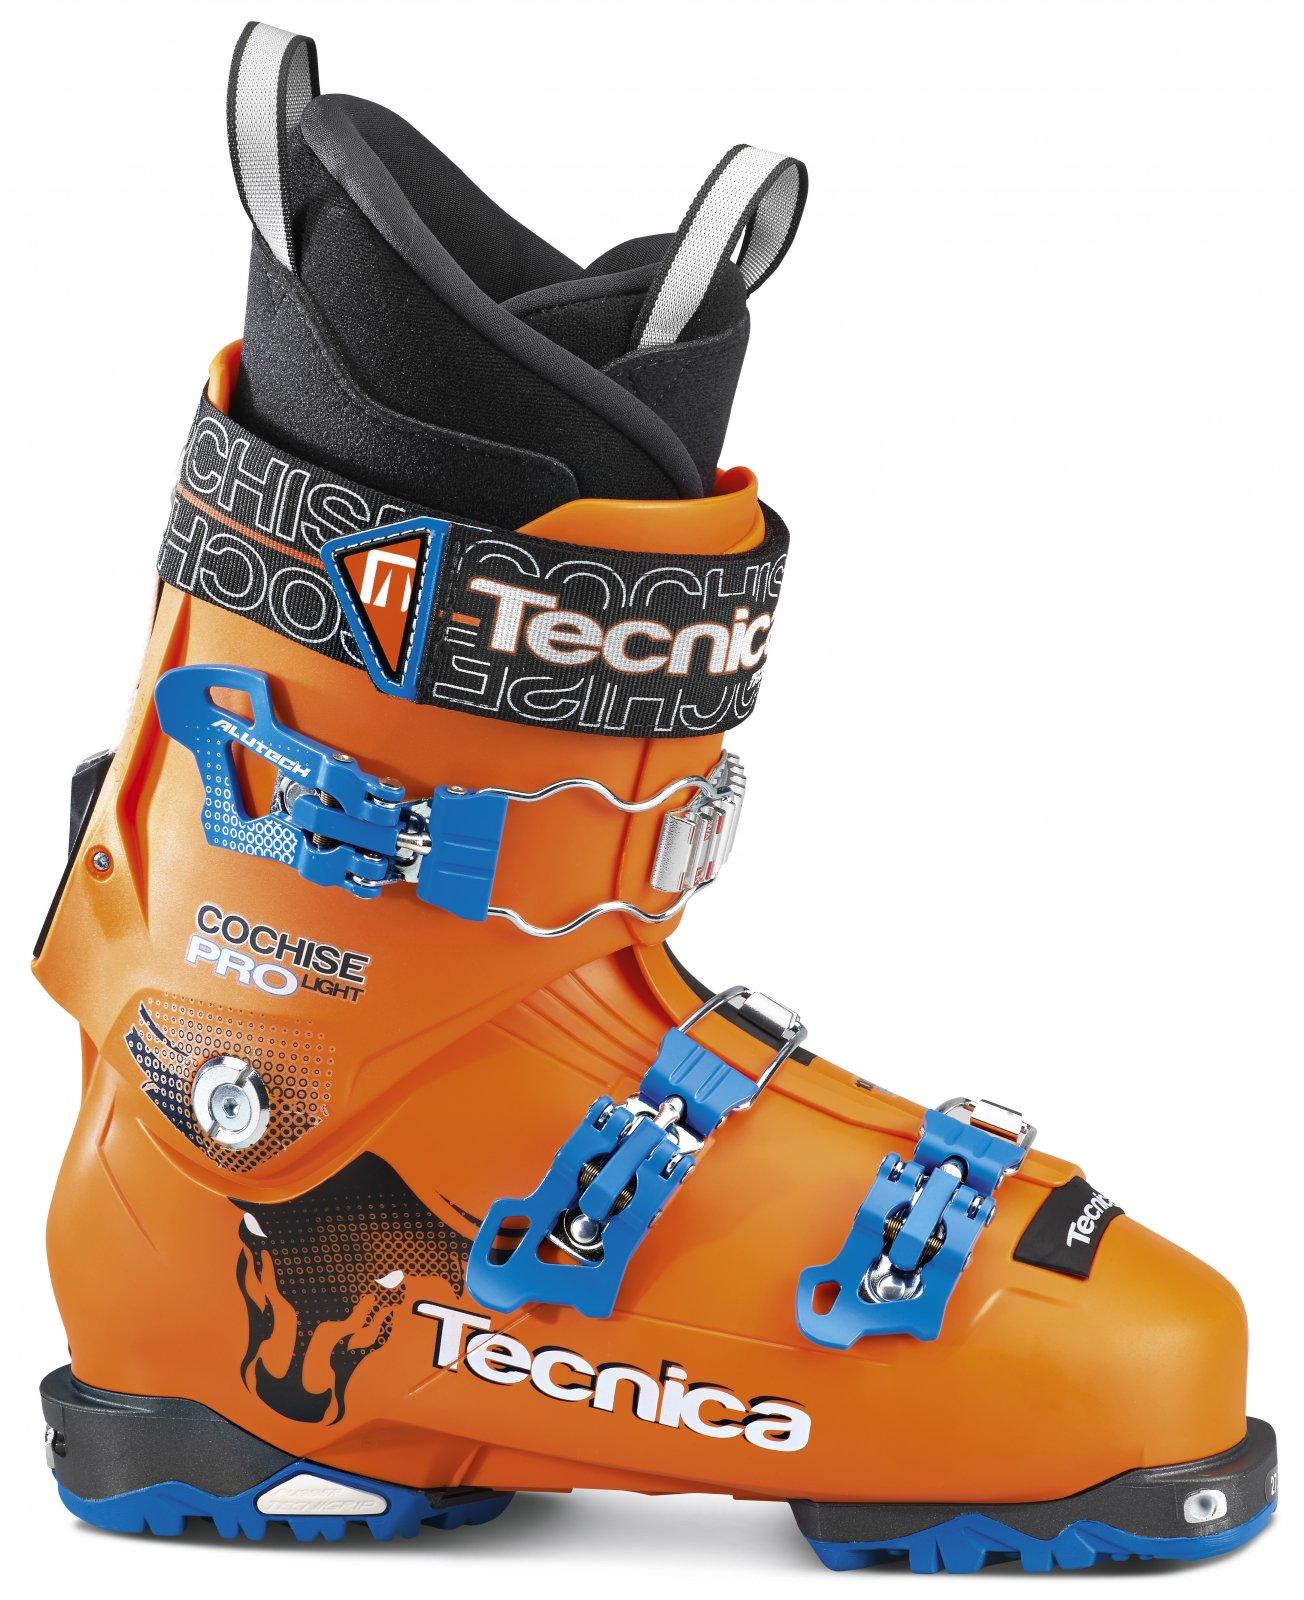 Tecnica Cochise Pro LT Ski Boots 2016